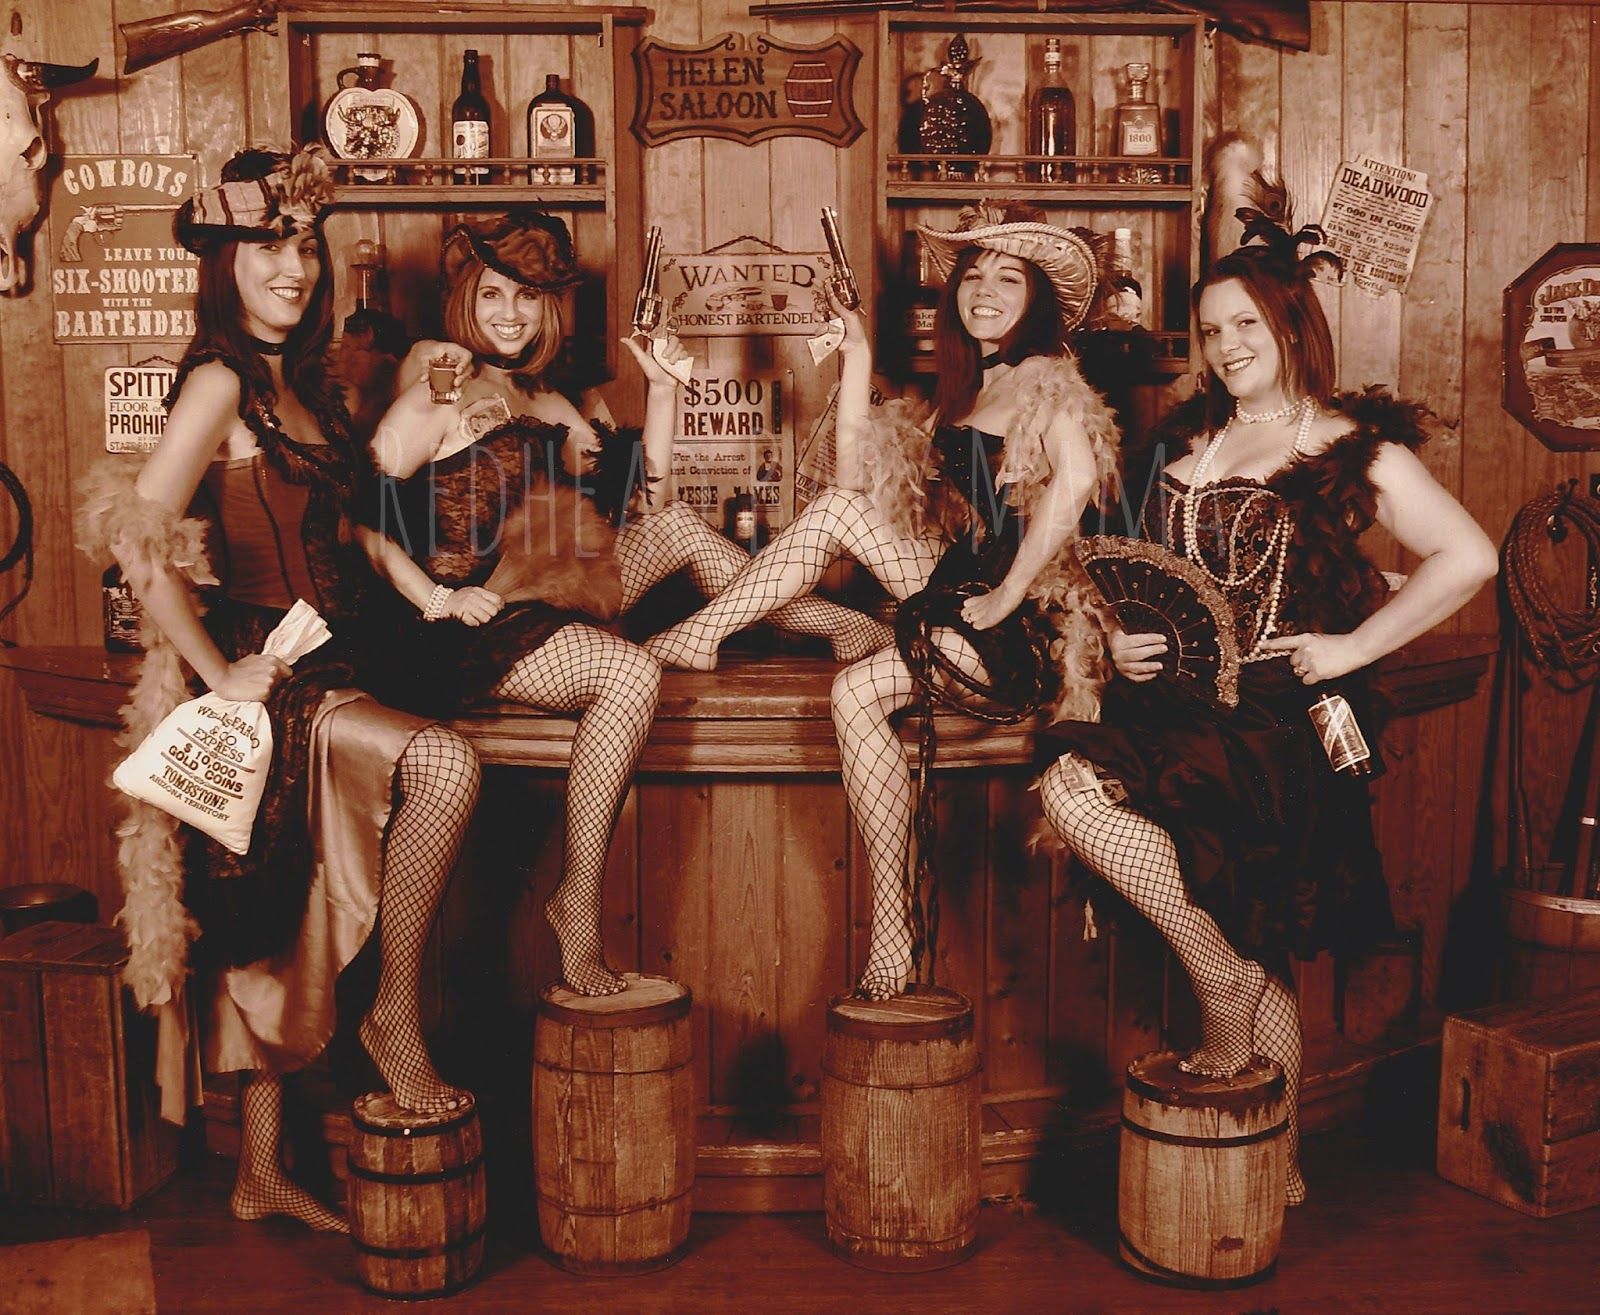 wild-saloon-girls-naked